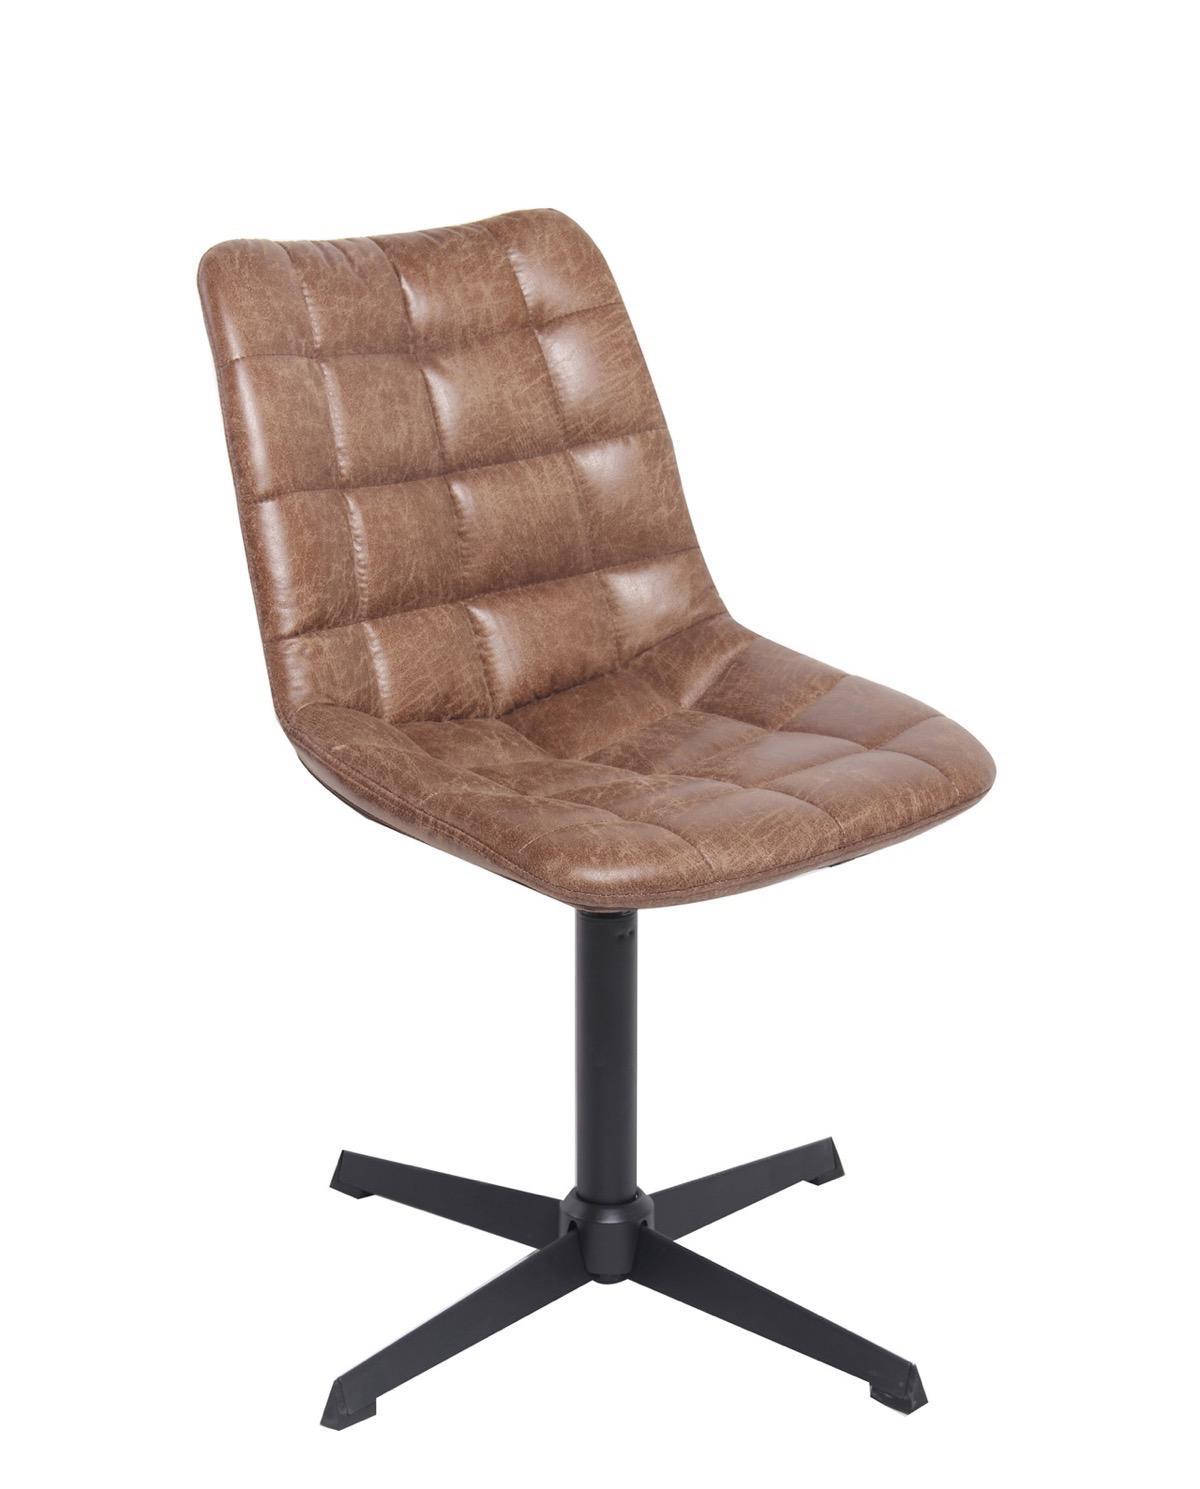 caya chaise lounge matelass e effet cuir vieilli. Black Bedroom Furniture Sets. Home Design Ideas